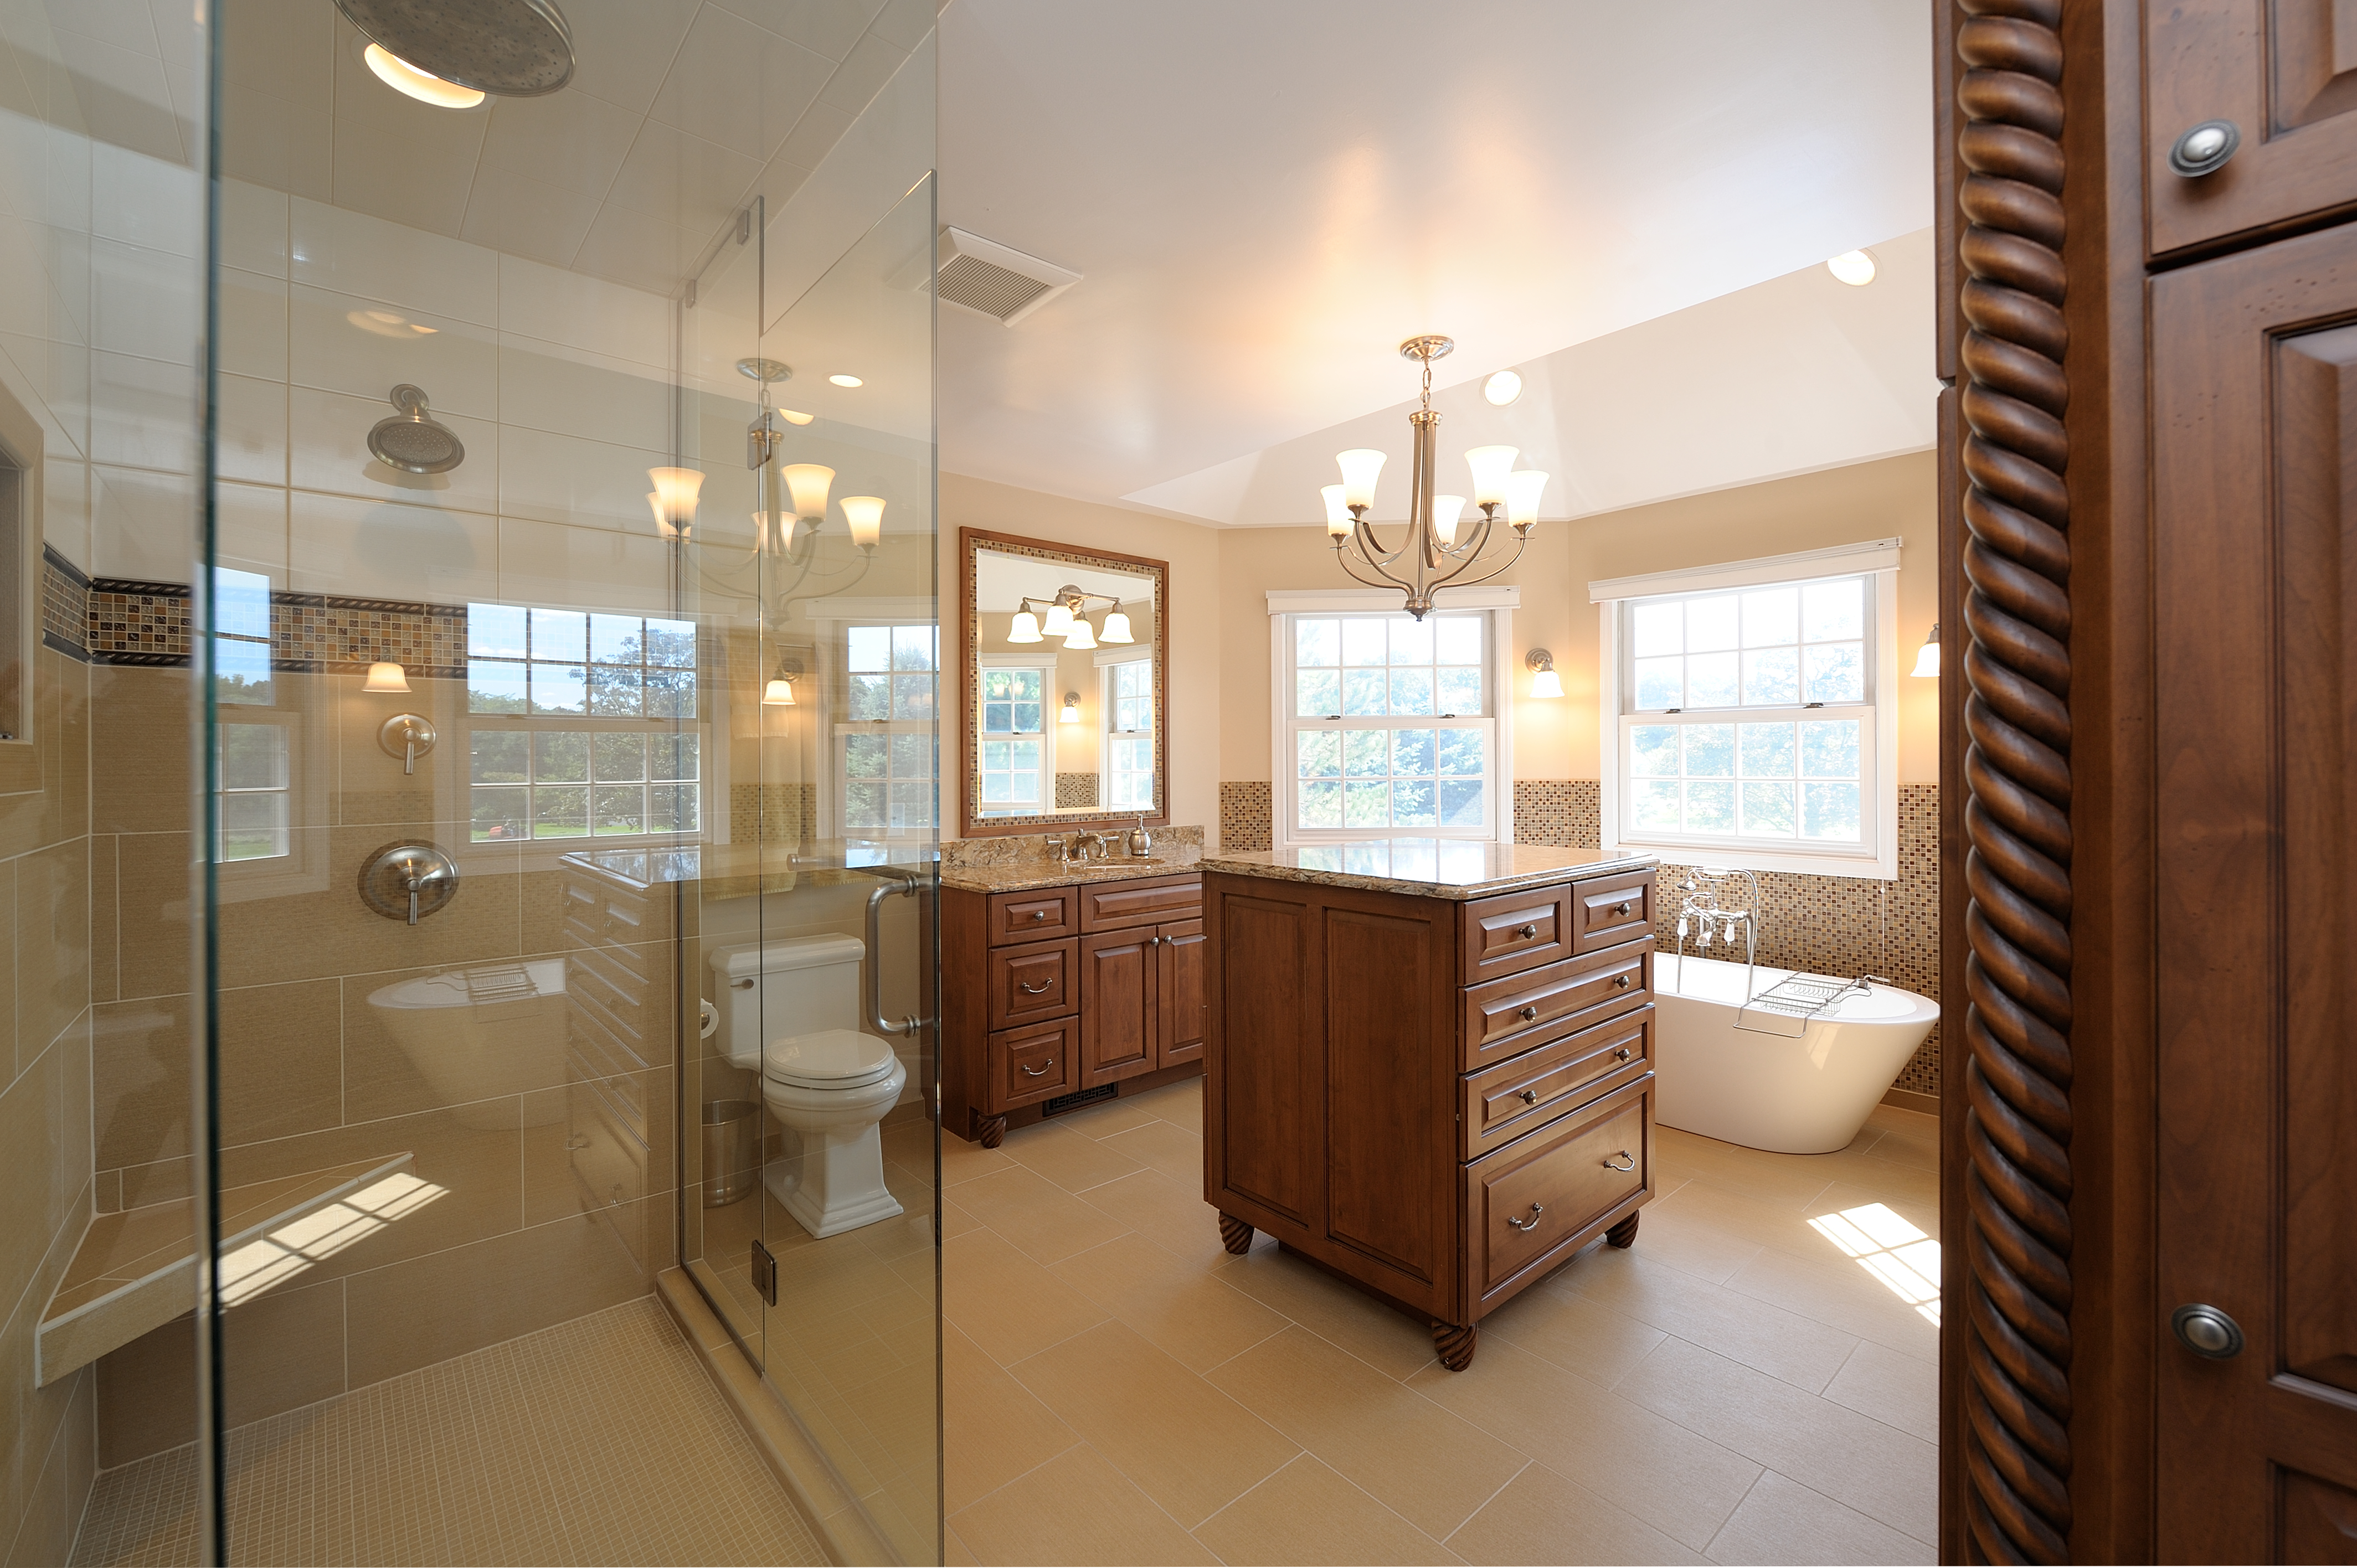 Master suite by Kalamazoo Custom Kitchens and Baths, Kalamazoo, MI